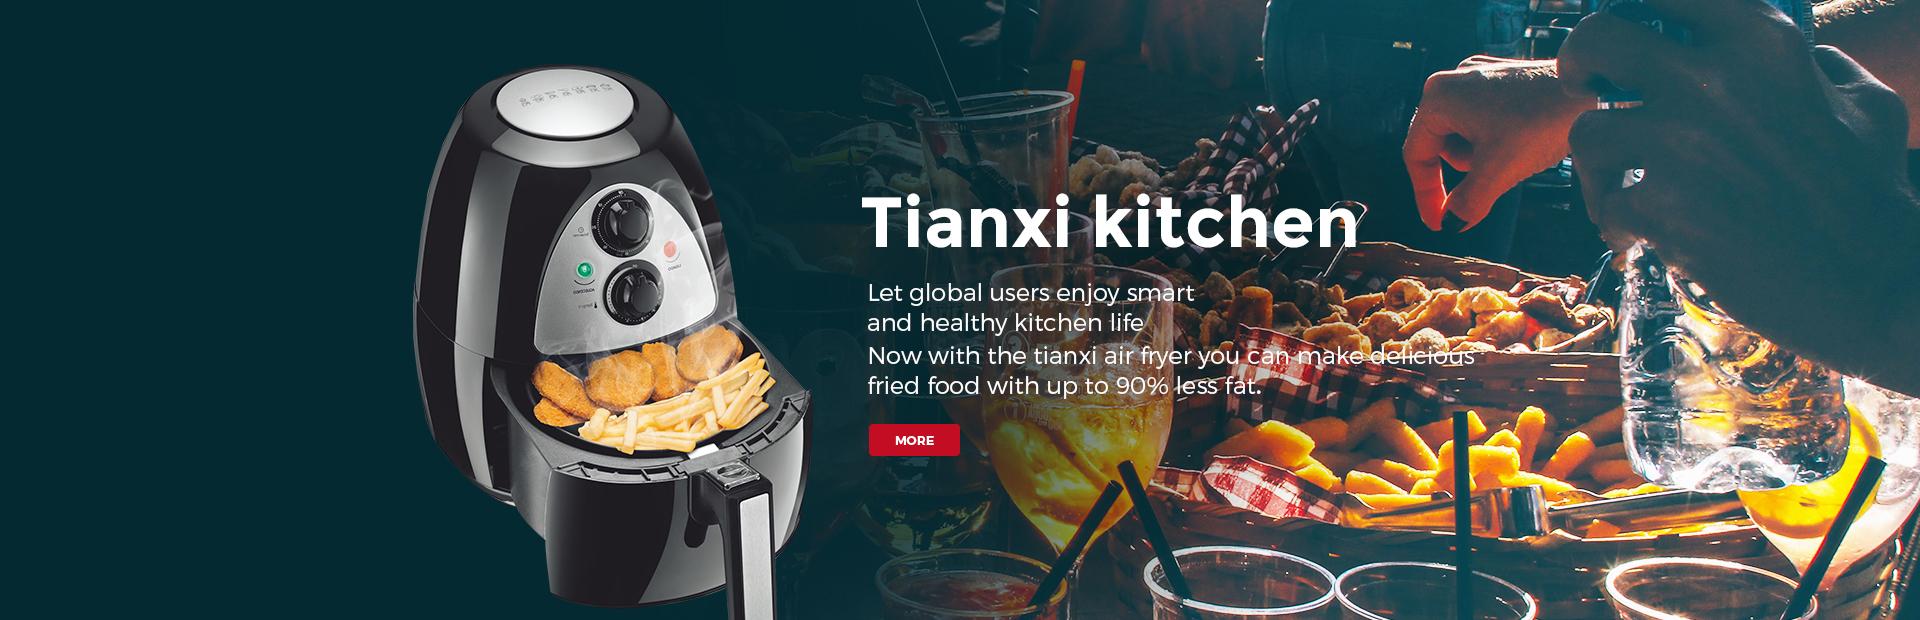 tianxi kitchen.jpg